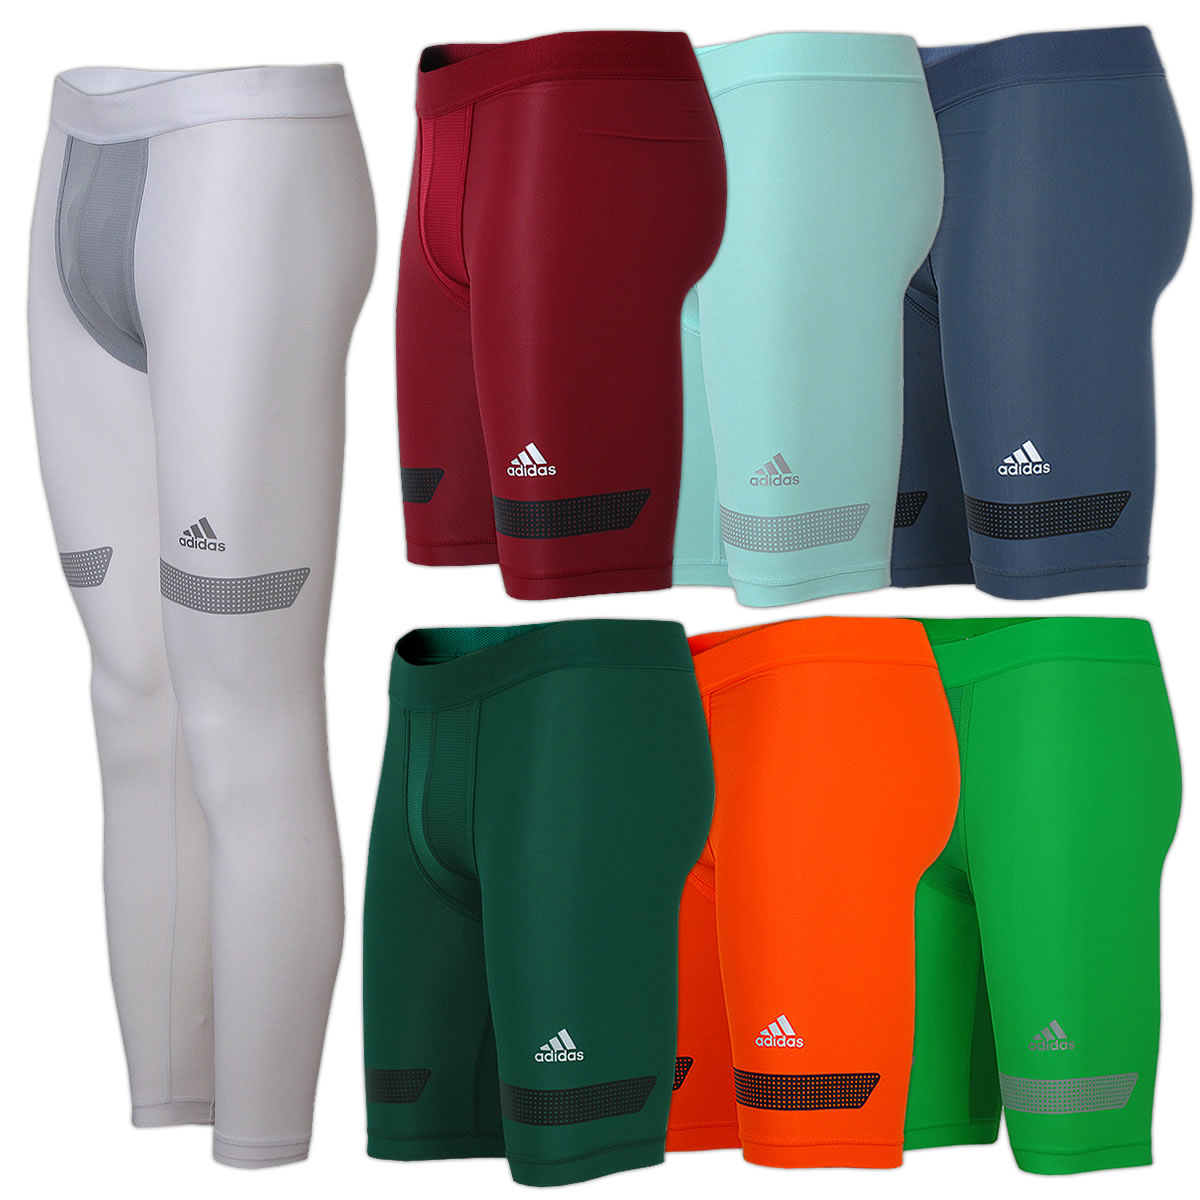 25b37eb4c5e2 adidas Herren Techfit Chill Tight Unterhose Laufhose Fußball Running  Kompression